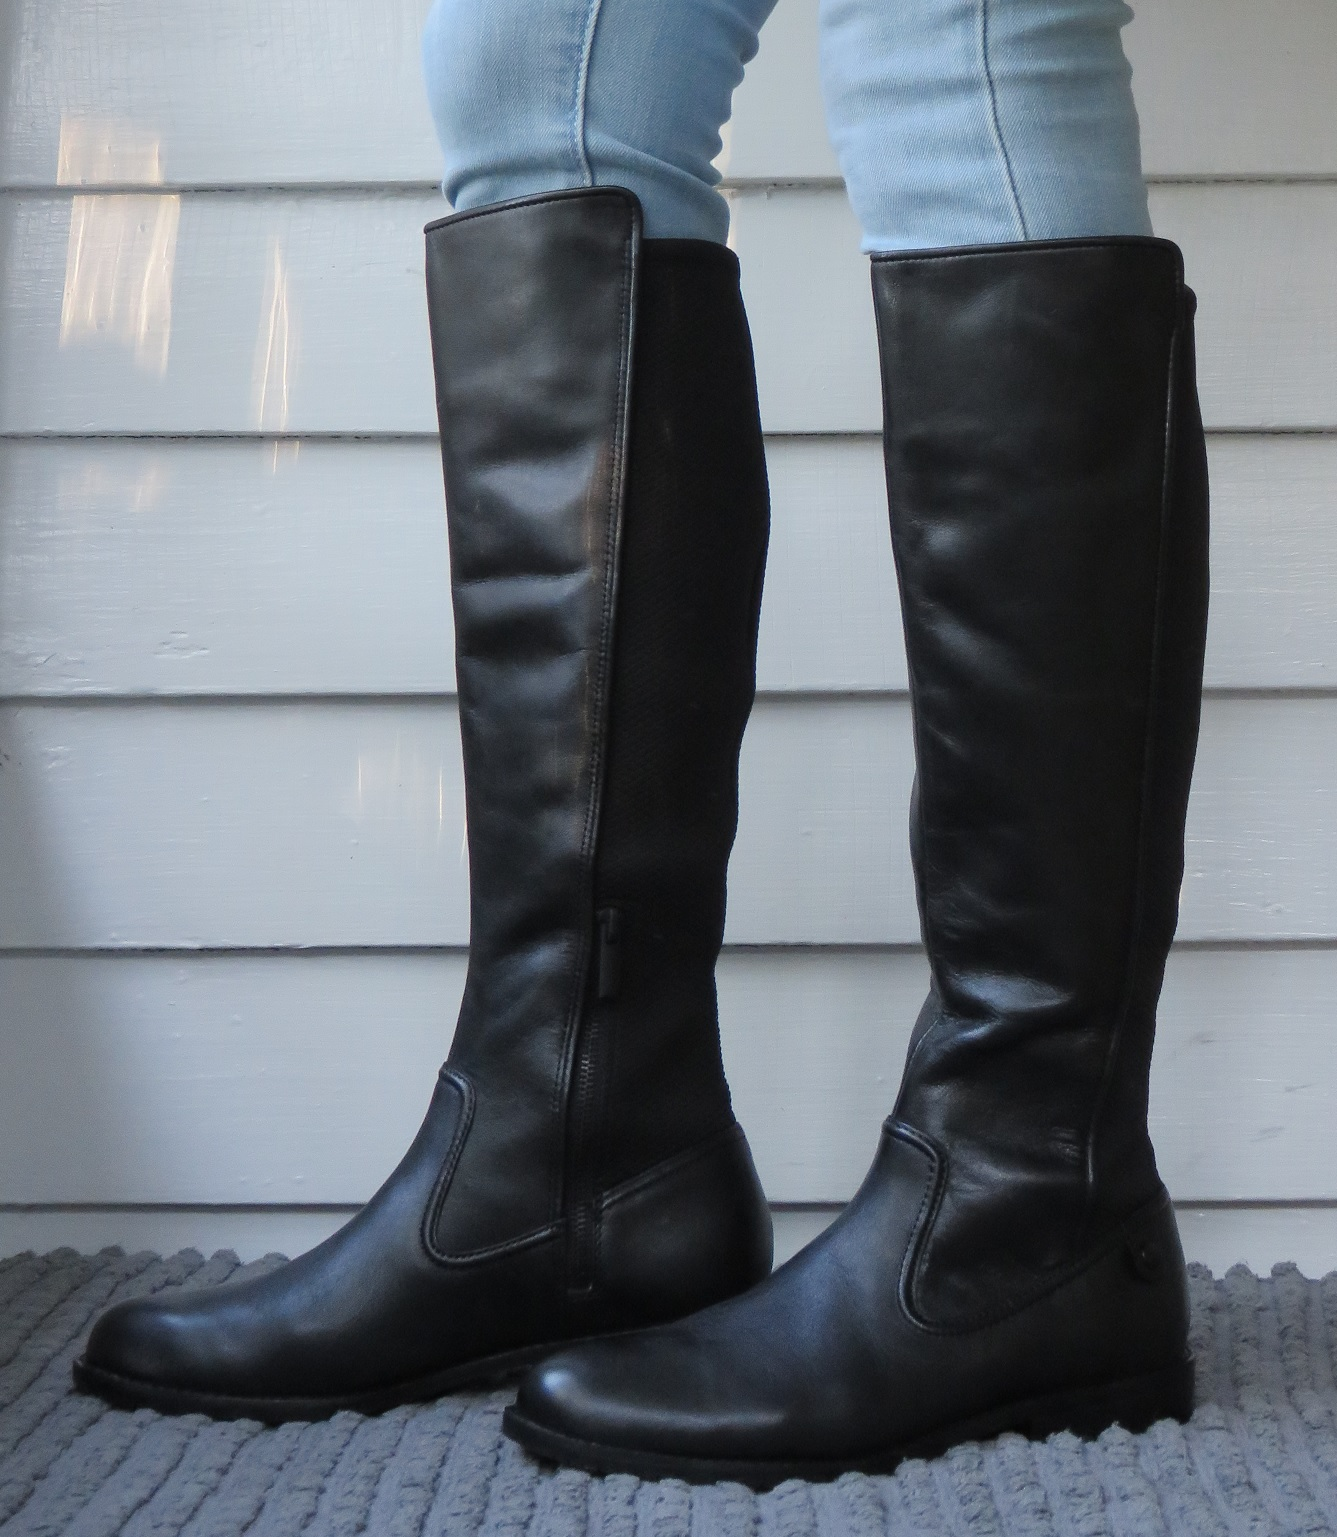 Howdy Slim Riding Boots For Thin Calves Lacoste Rosolinn